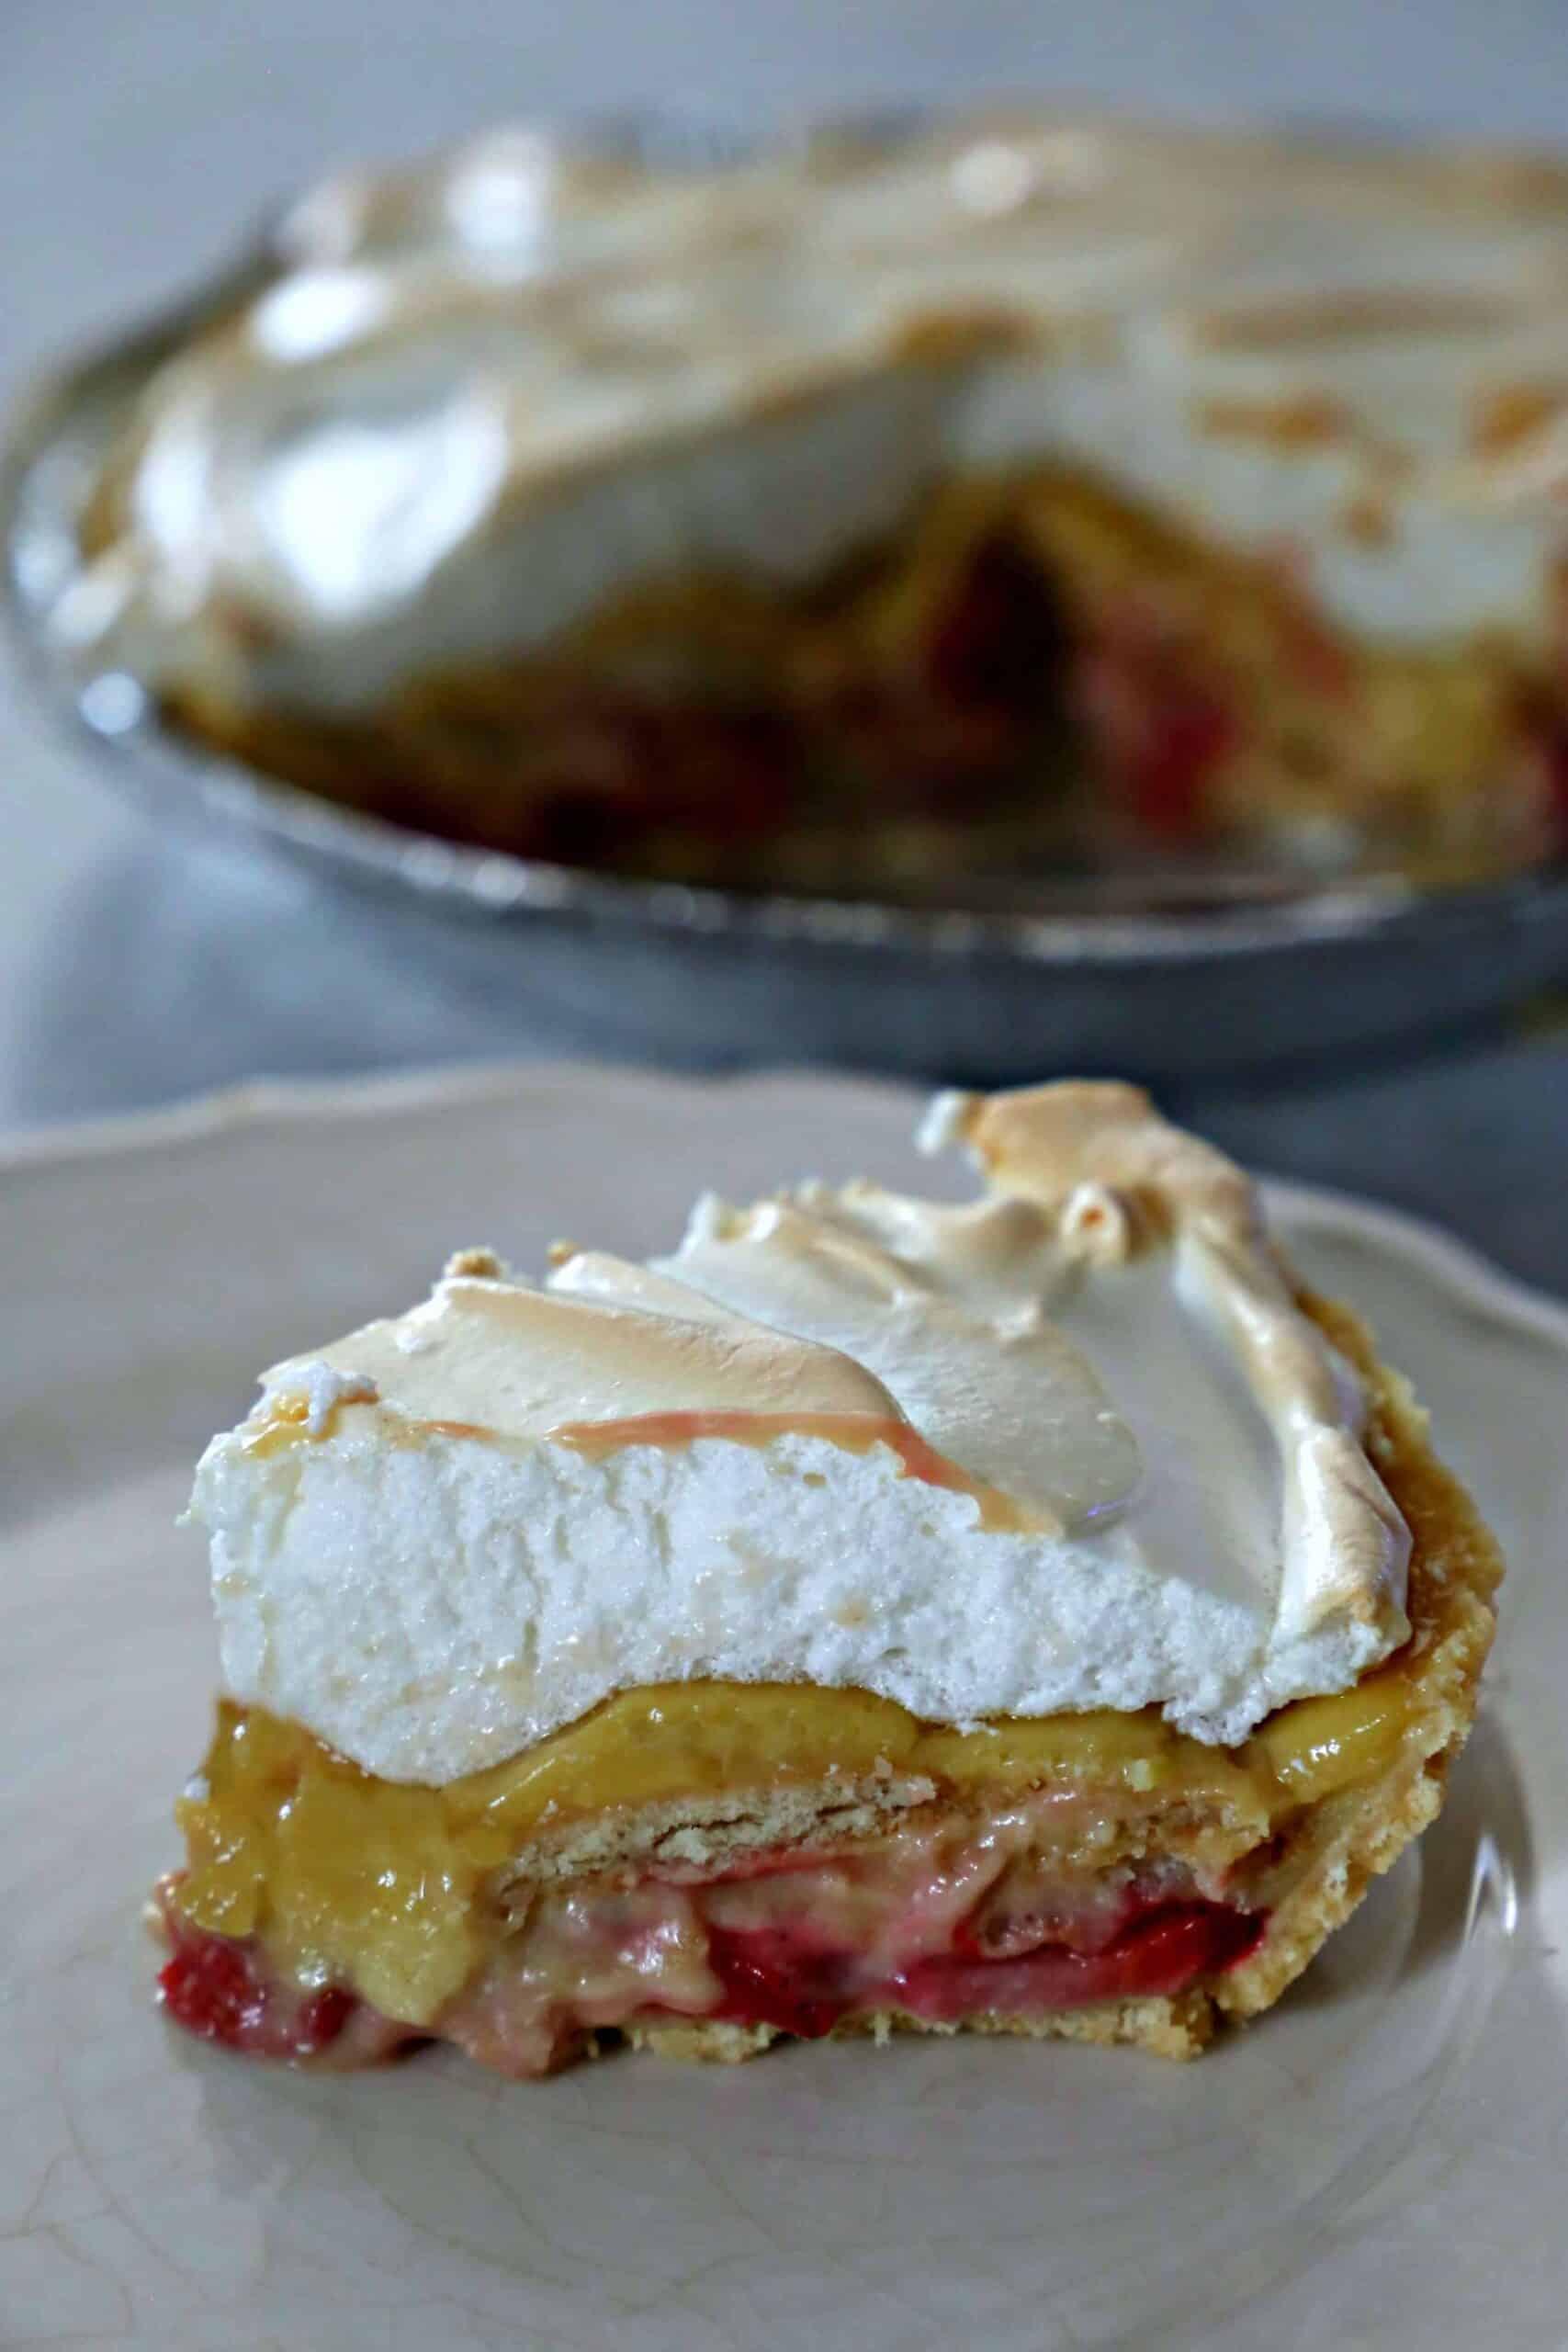 slice of strawberry pudding pie